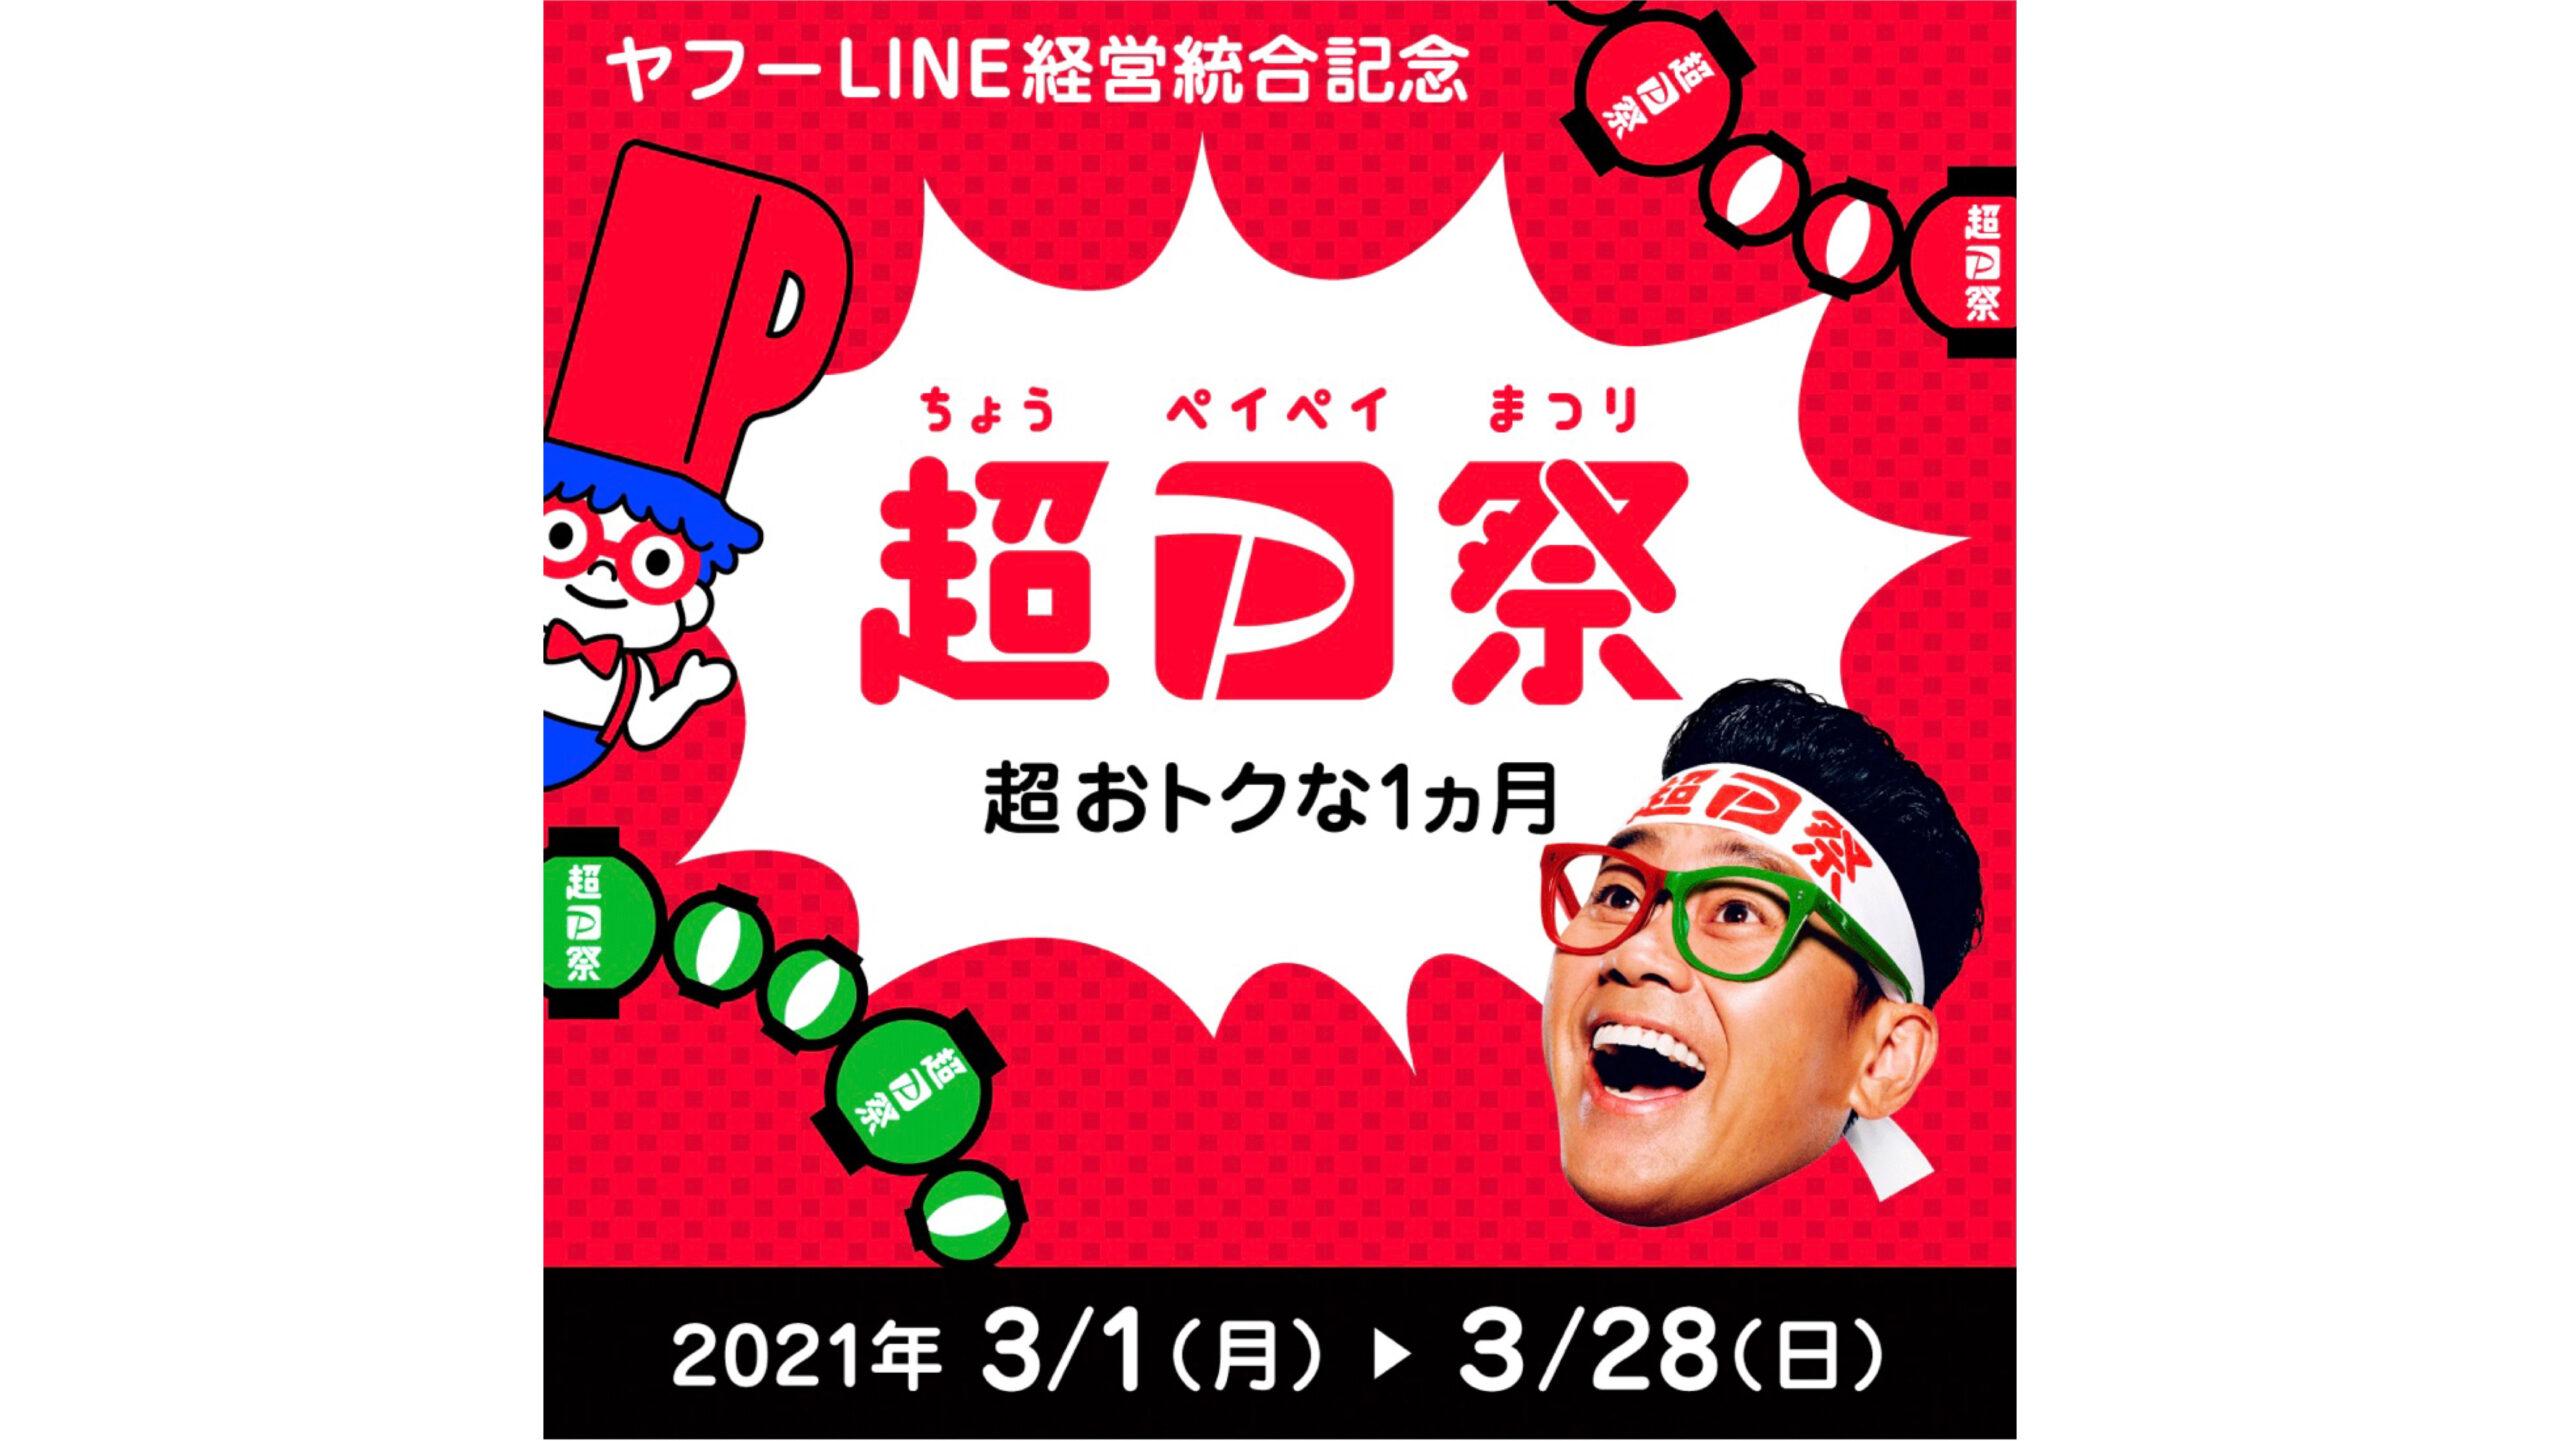 PayPay「超P祭」3/1〜3/28!ホワイトニングと水素吸入でポイント還元♪